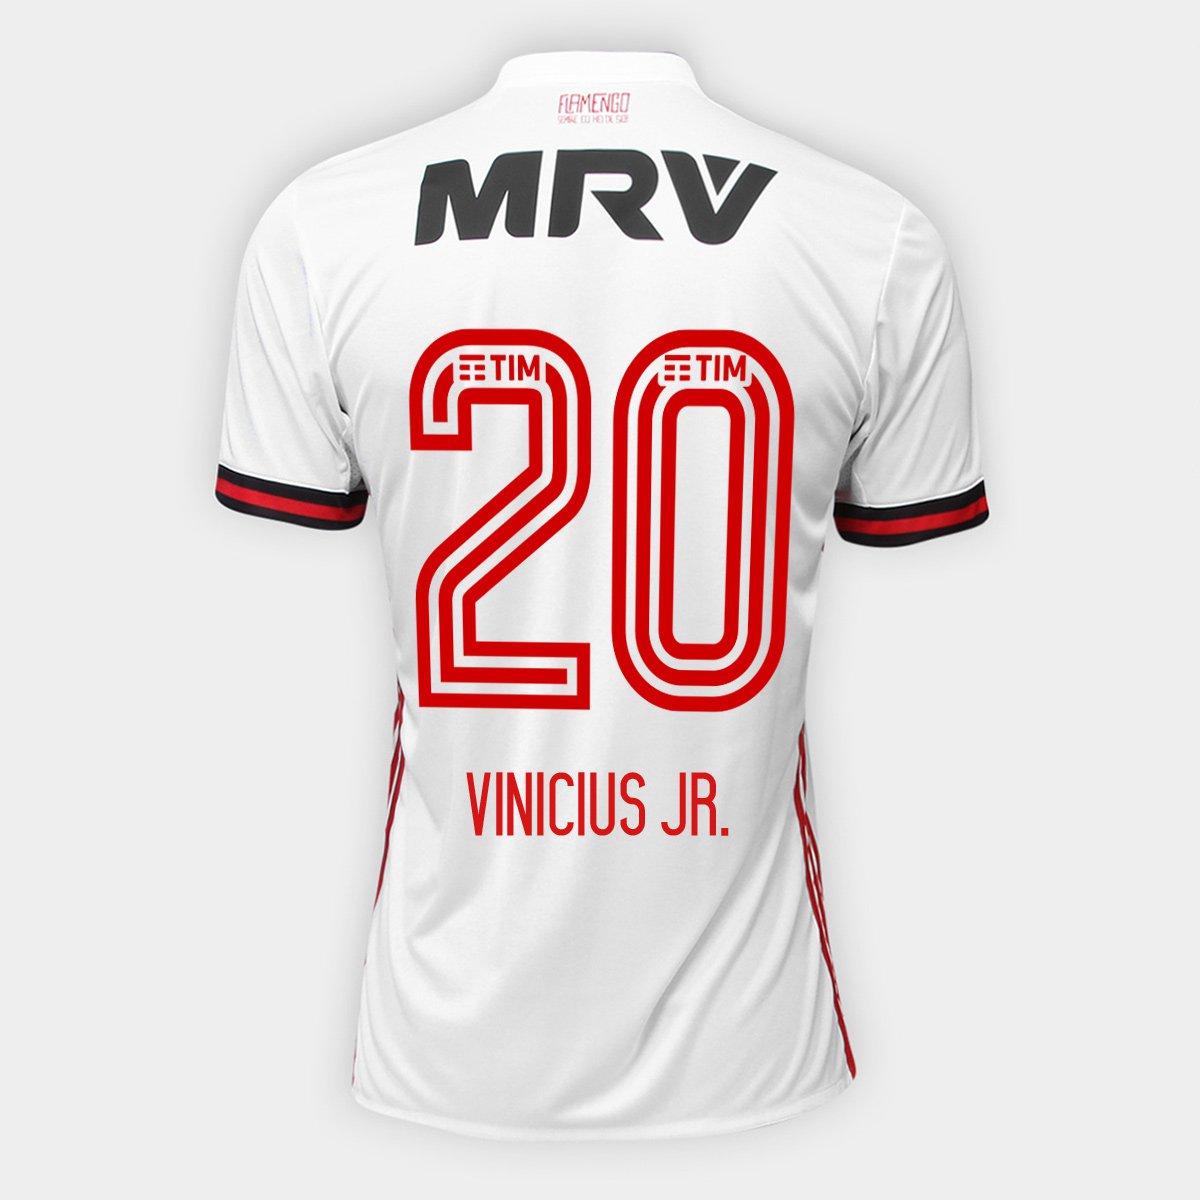 Camisa Adidas Flamengo II 17 18 N° 20 - Vinicius Jr. - Compre Agora ... 293668ebd9a80